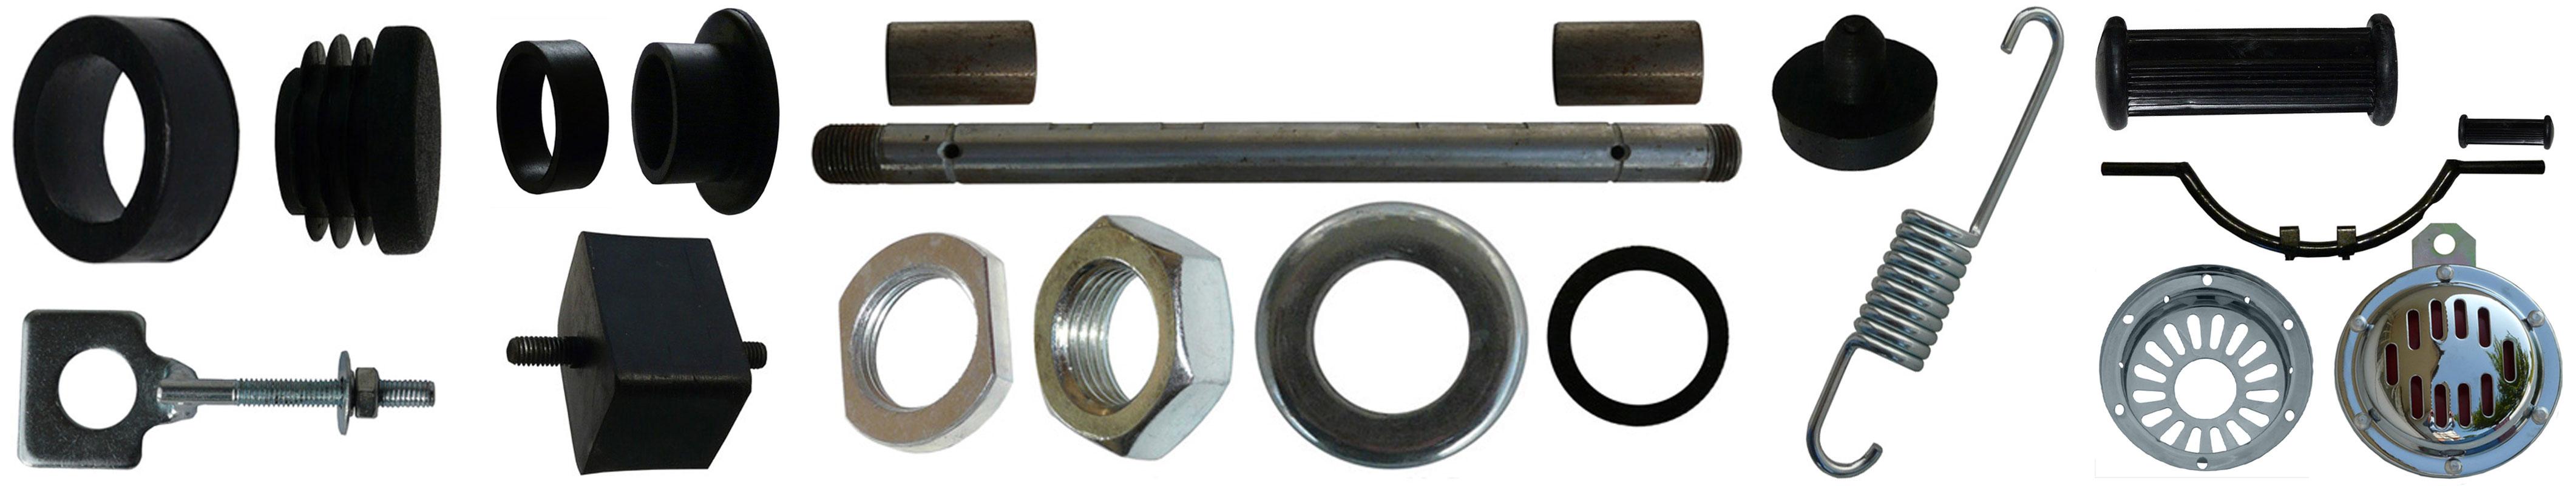 MZ ES 175/2 250/2 Ersatzteile Rahmen Anbauteile